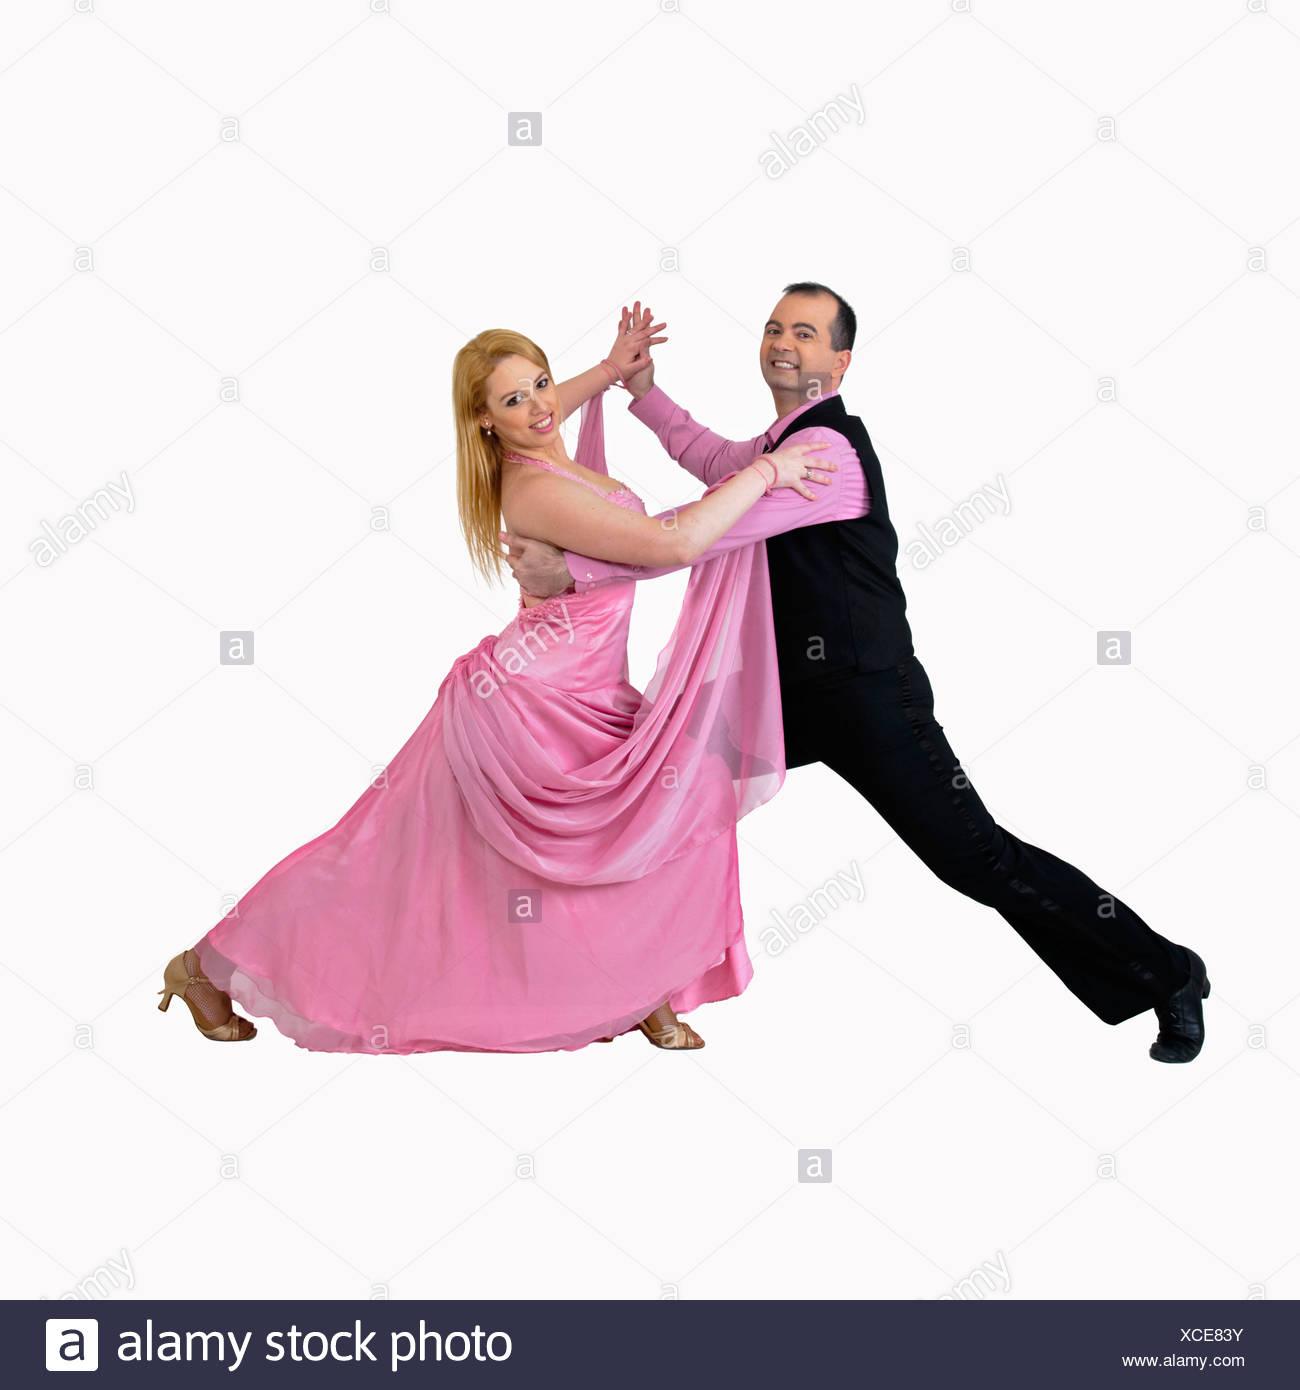 Ballroom dancers posing together - Stock Image